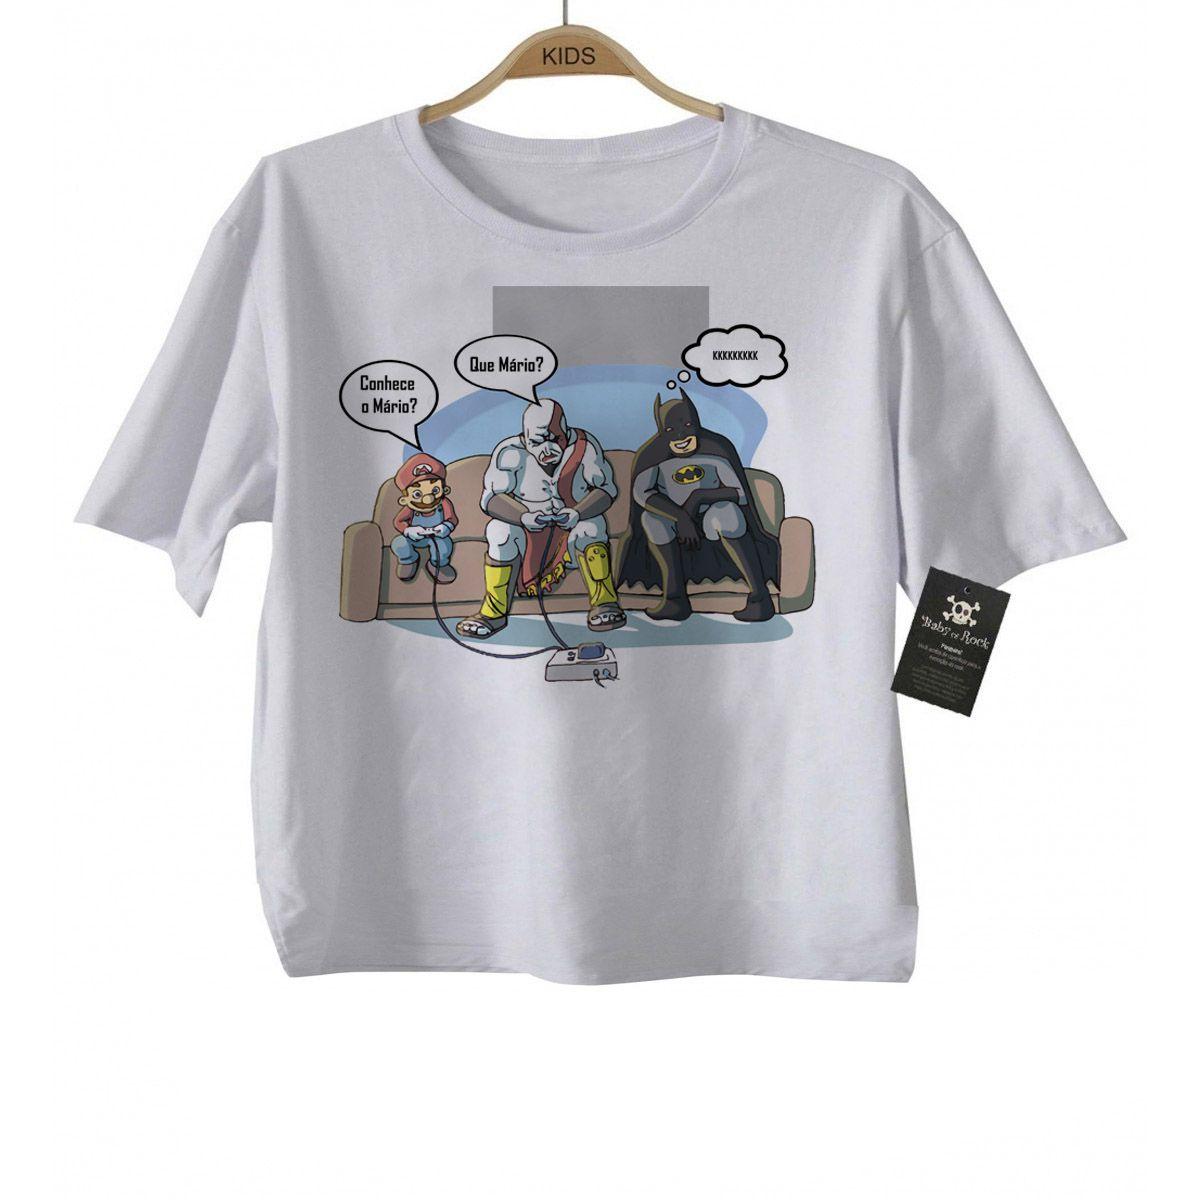 Camiseta  Bebê Super Gamer-  White - Mario / Batman  - Baby Monster S/A